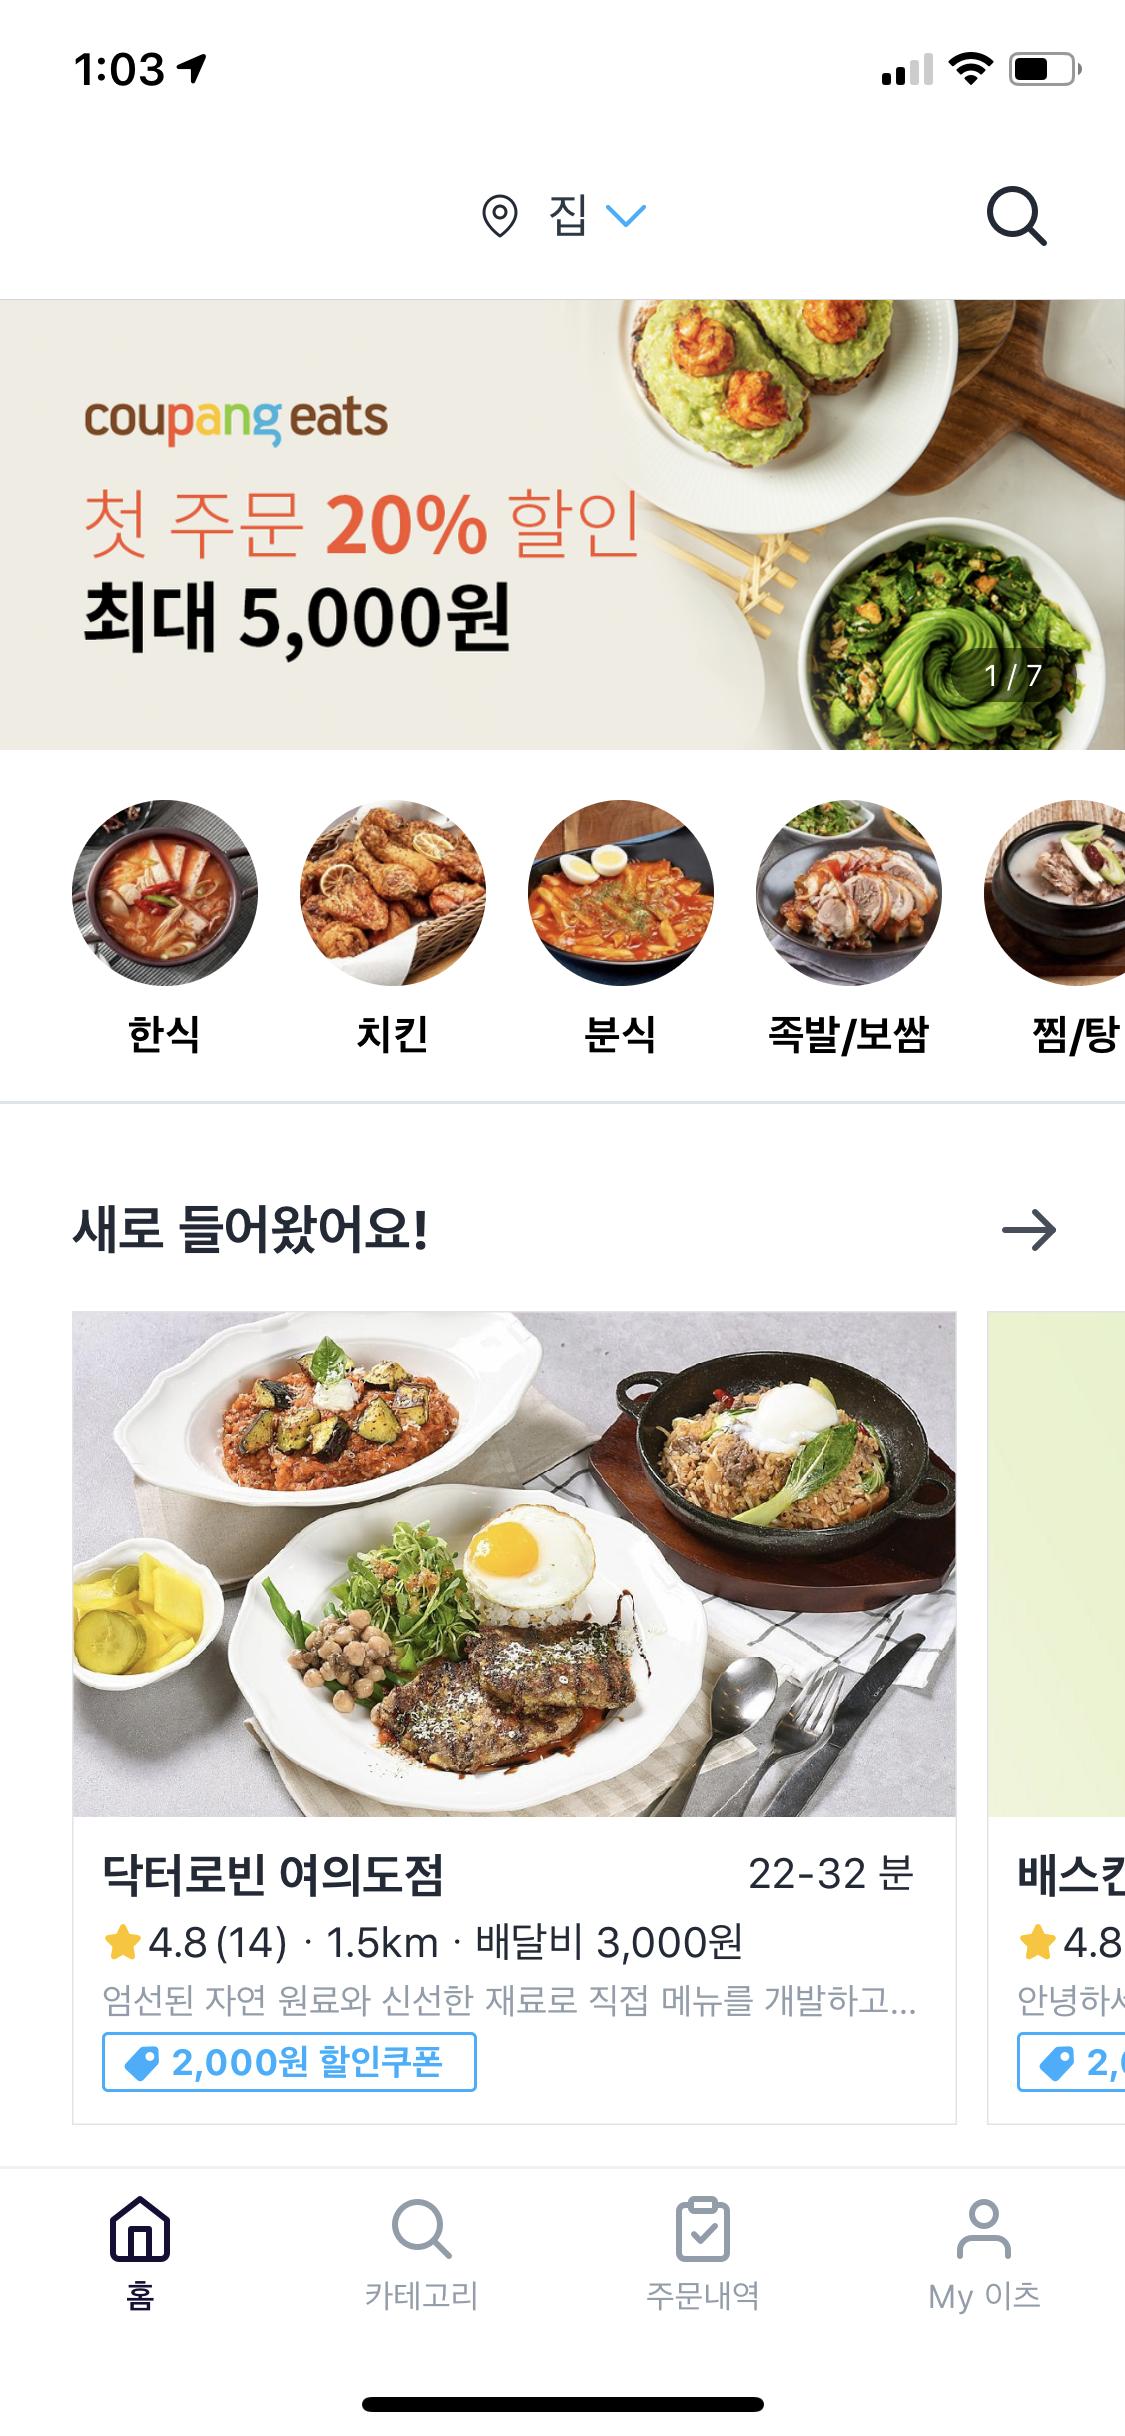 coupang eats app